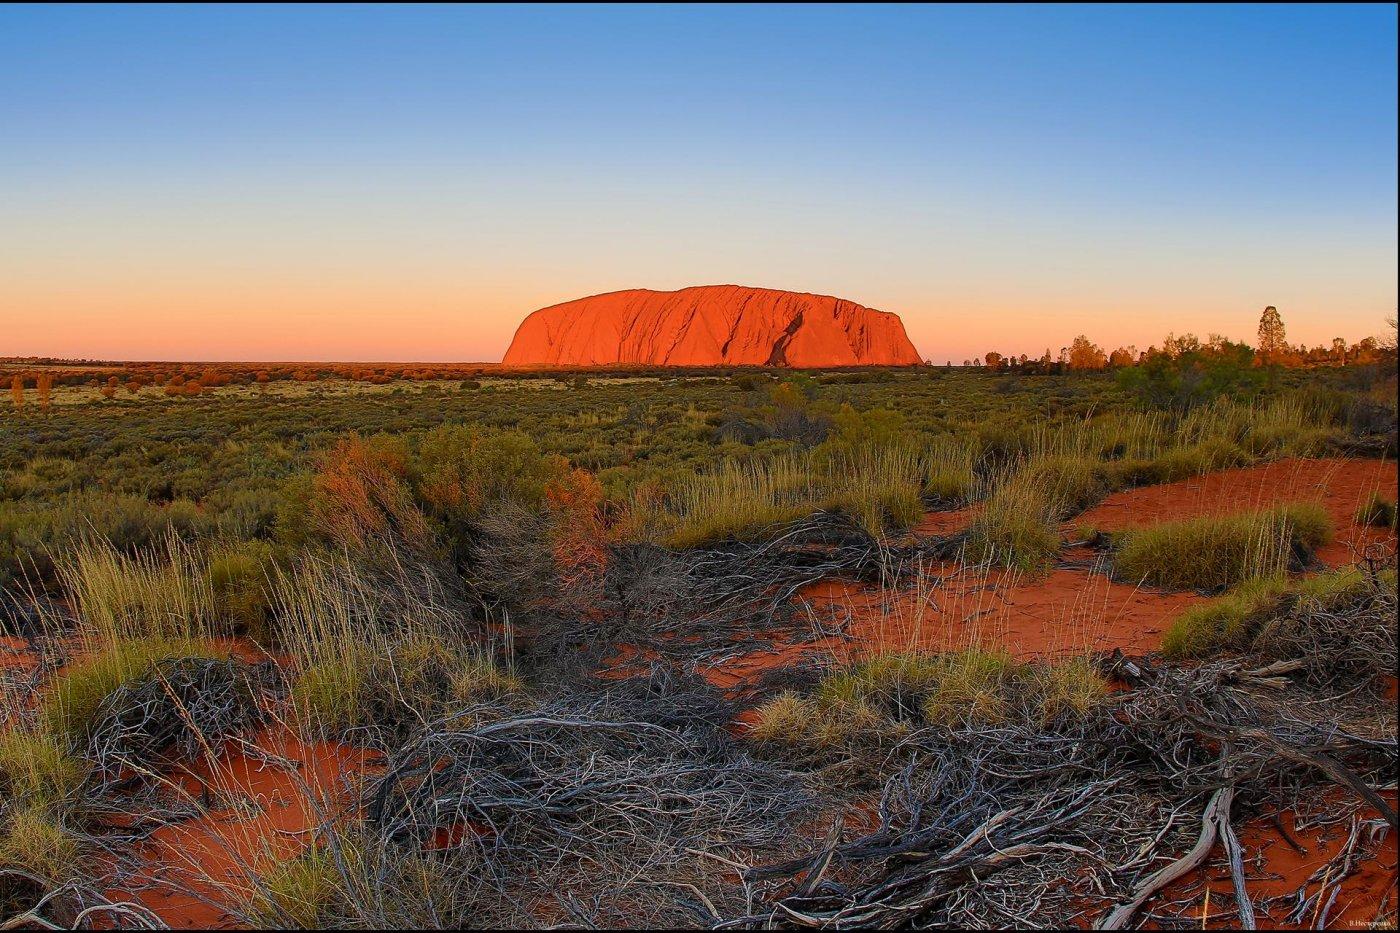 Фото 0197-4 (Copy).jpg. Австралия, Northern Territory, Uluru Summit Walk